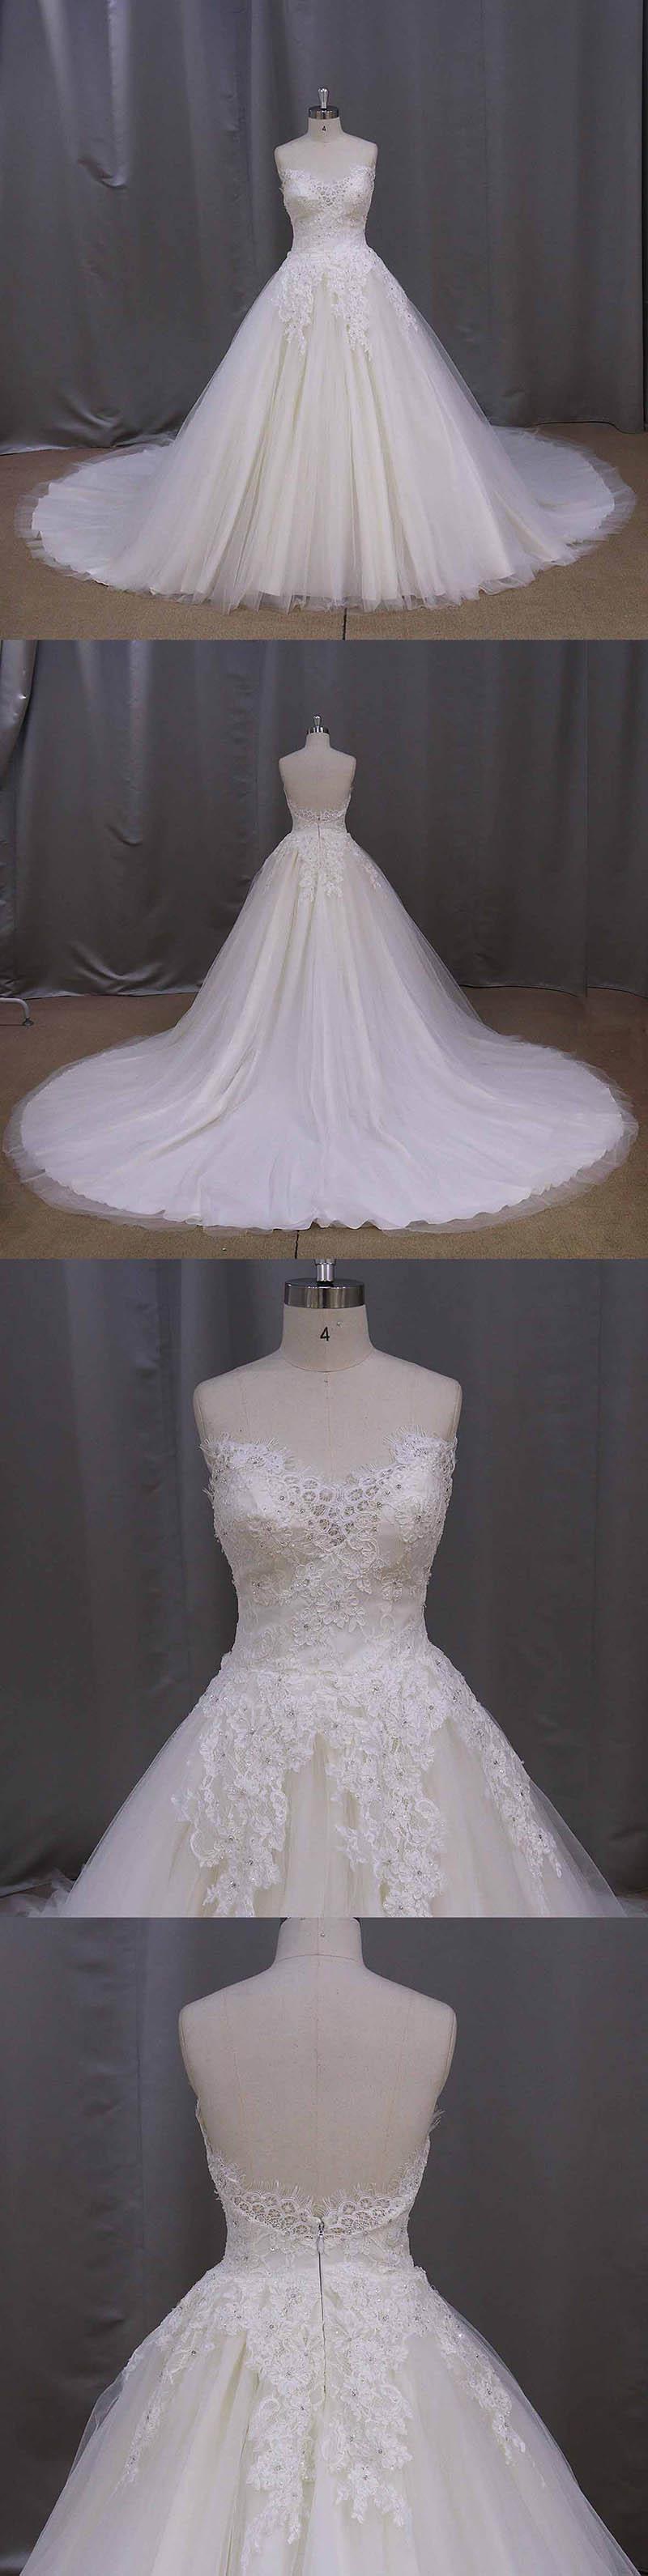 Sweetheart Ball Gowns Wedding Dress Notes